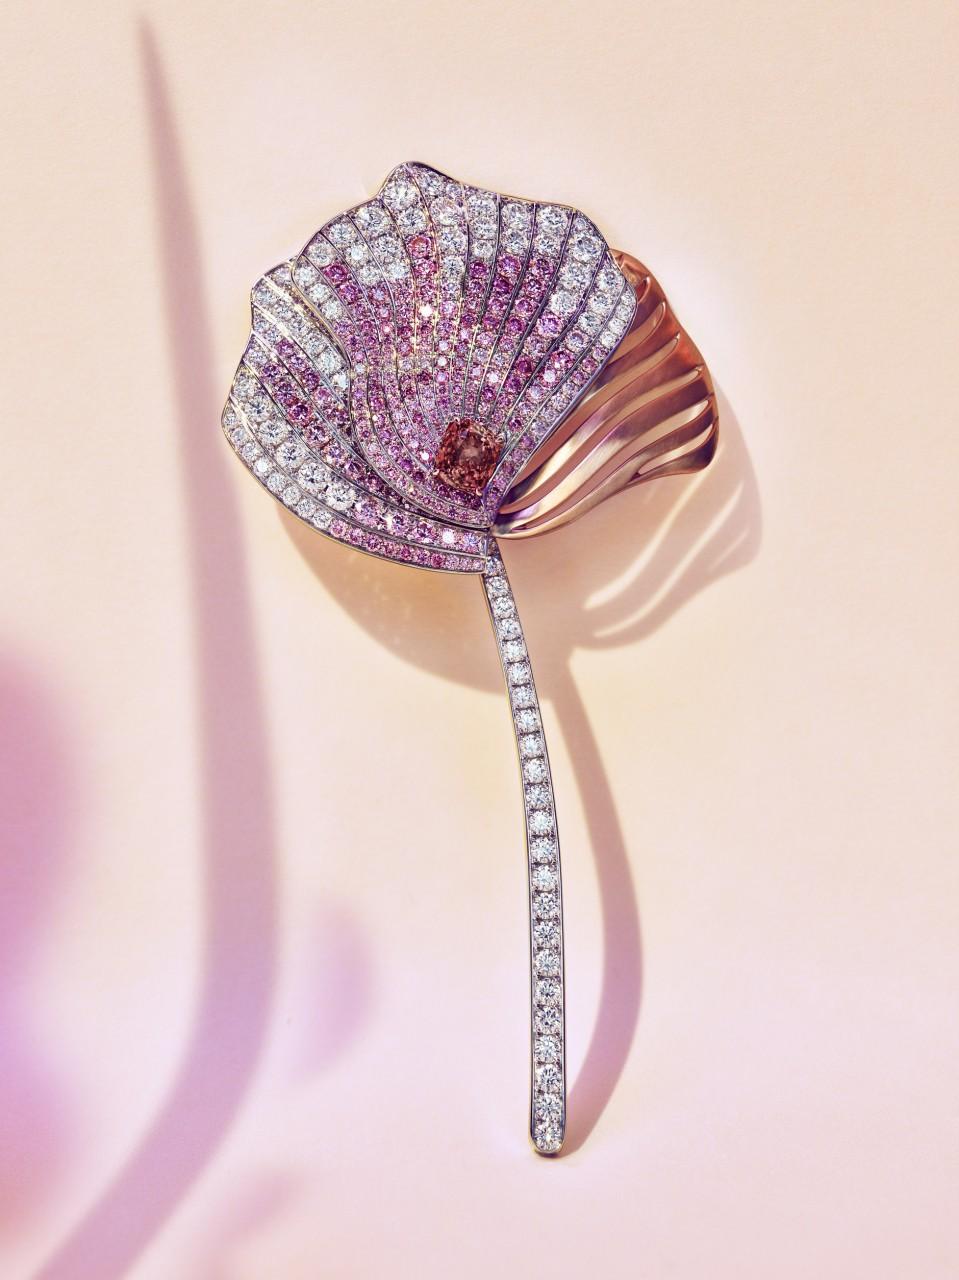 Tiffany & Co. представили коллекцию